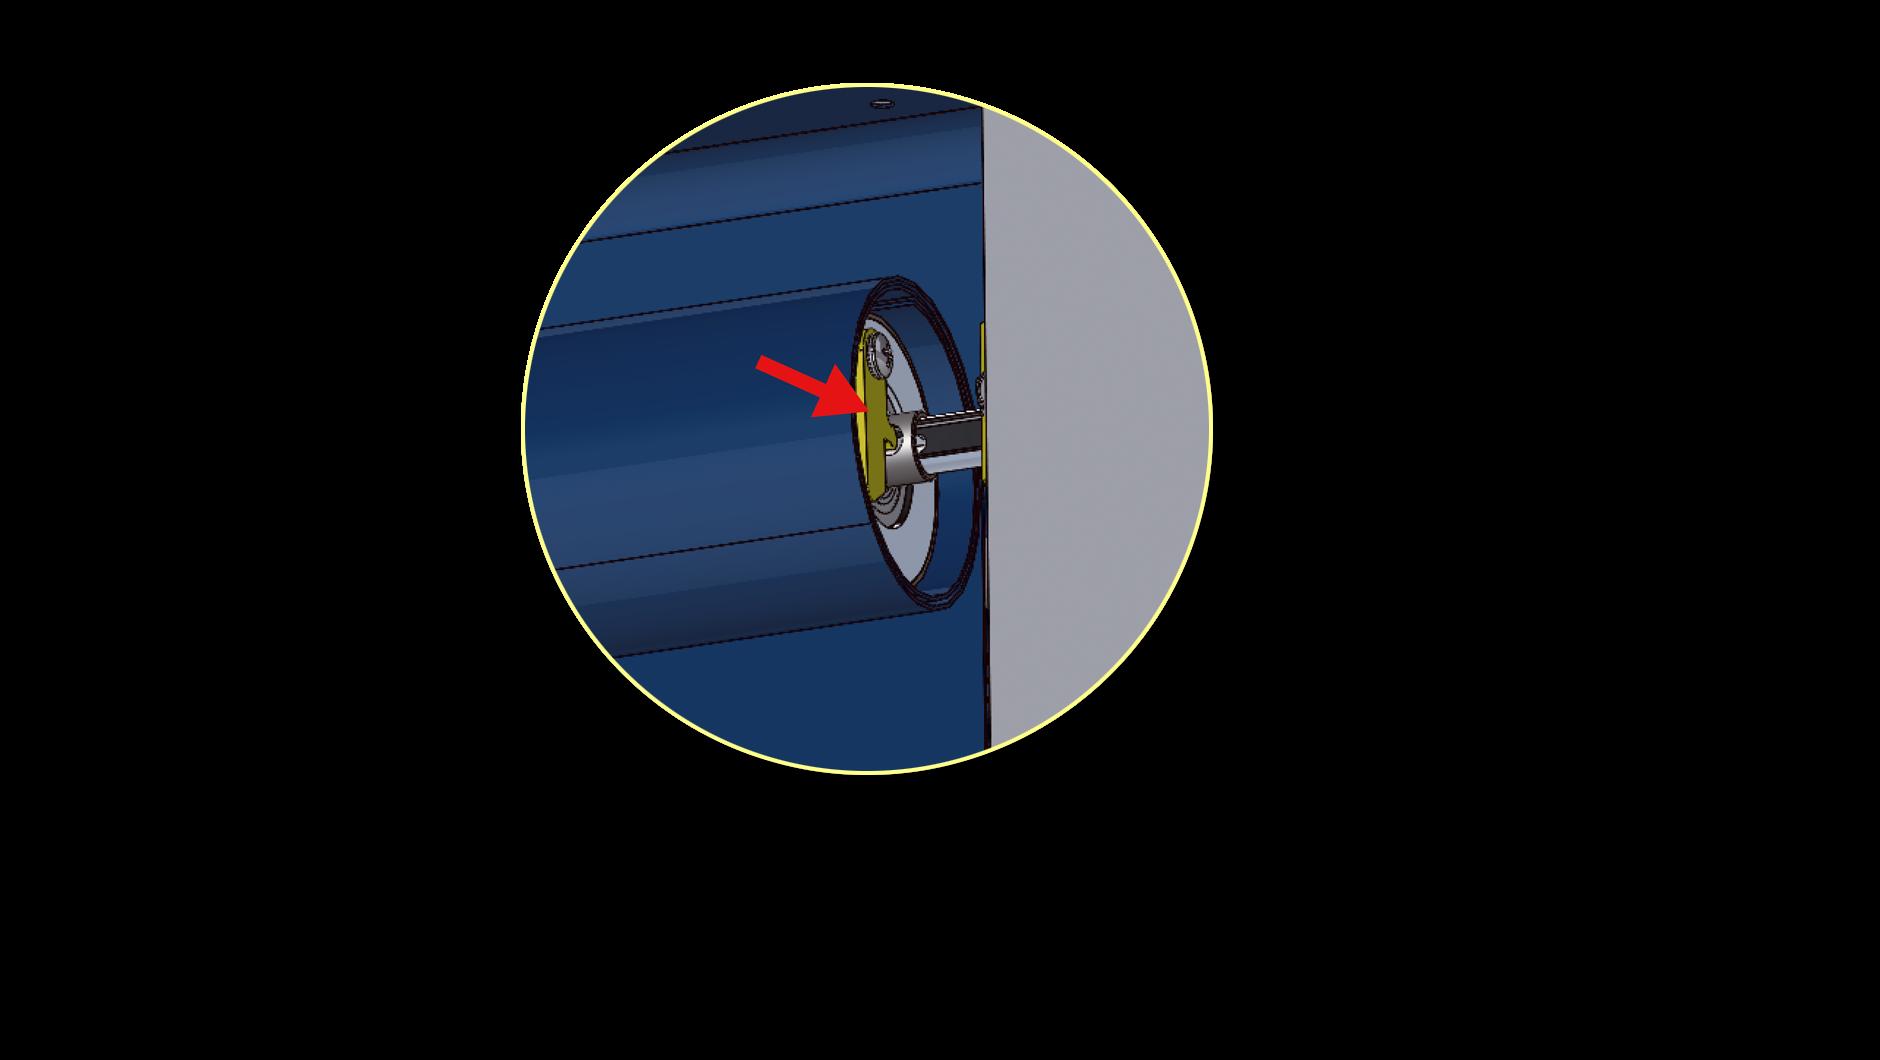 kool shield manufacturing documentation cad rendering